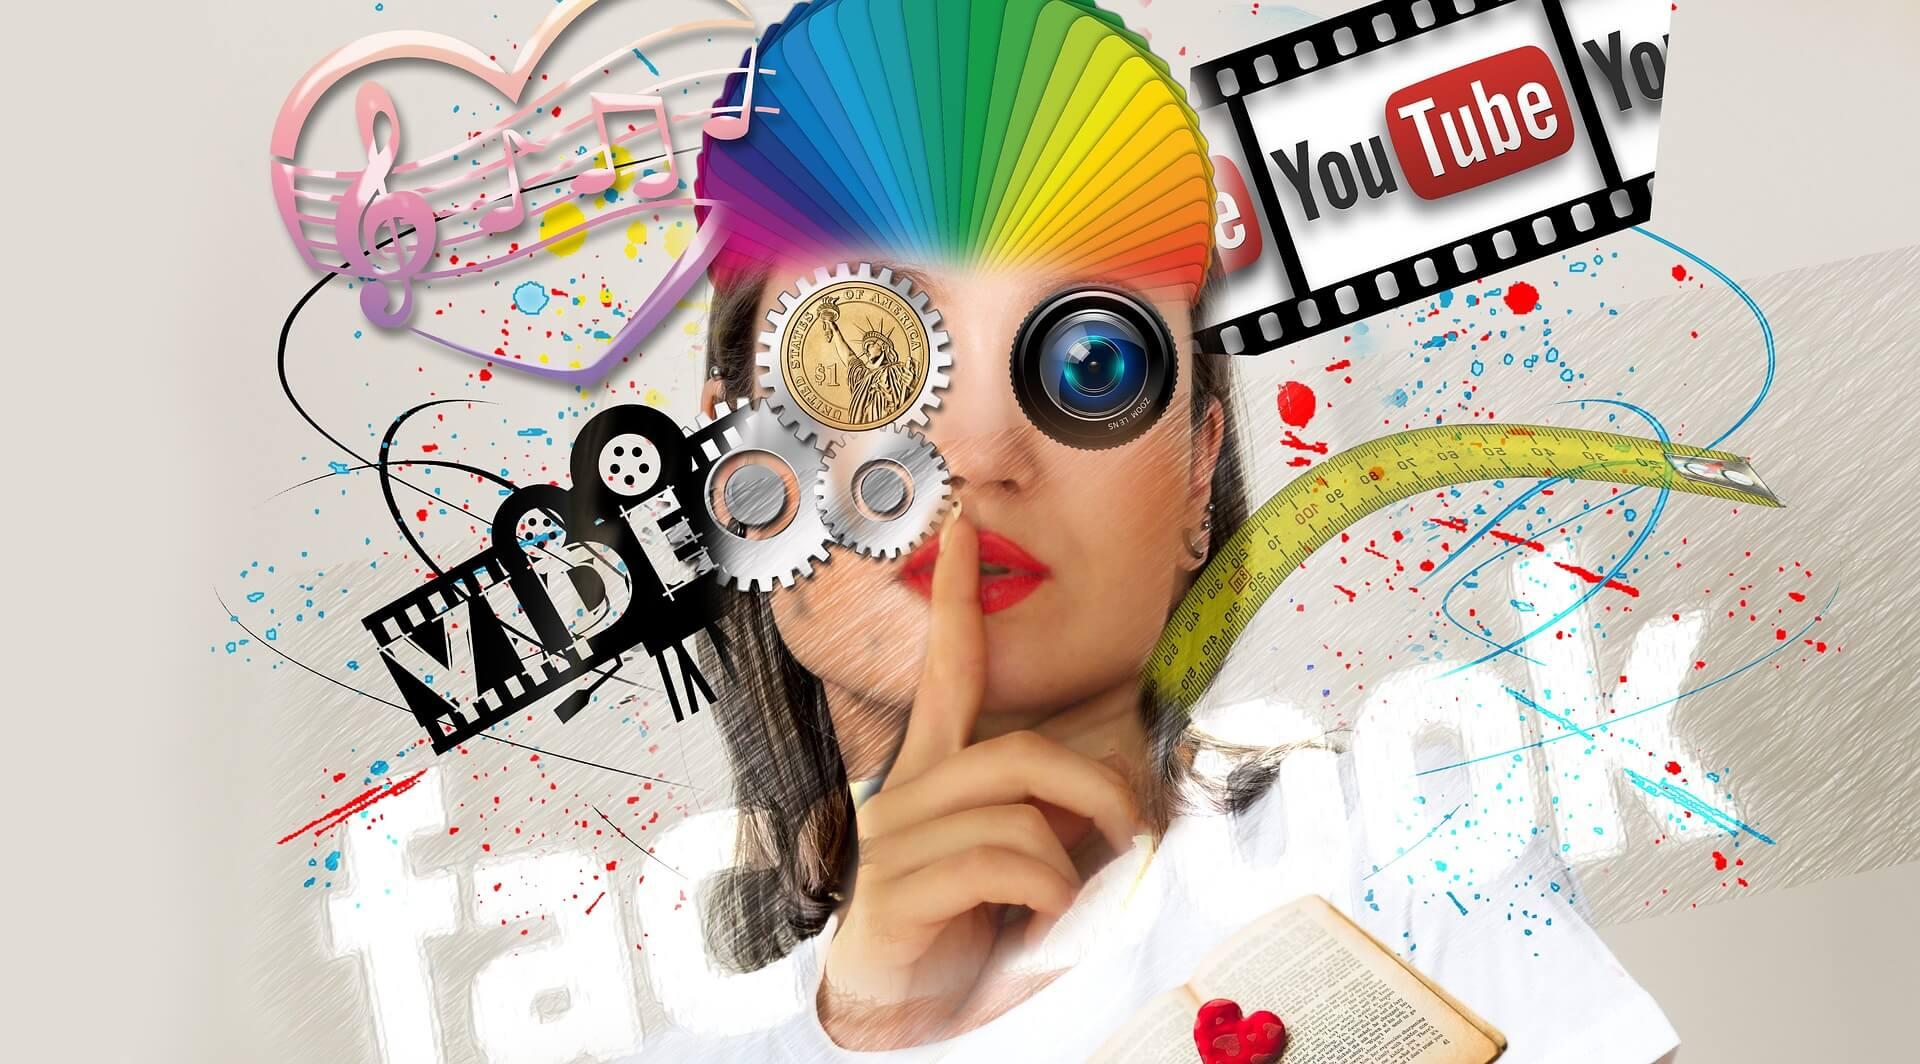 Sleep better by silencing social media